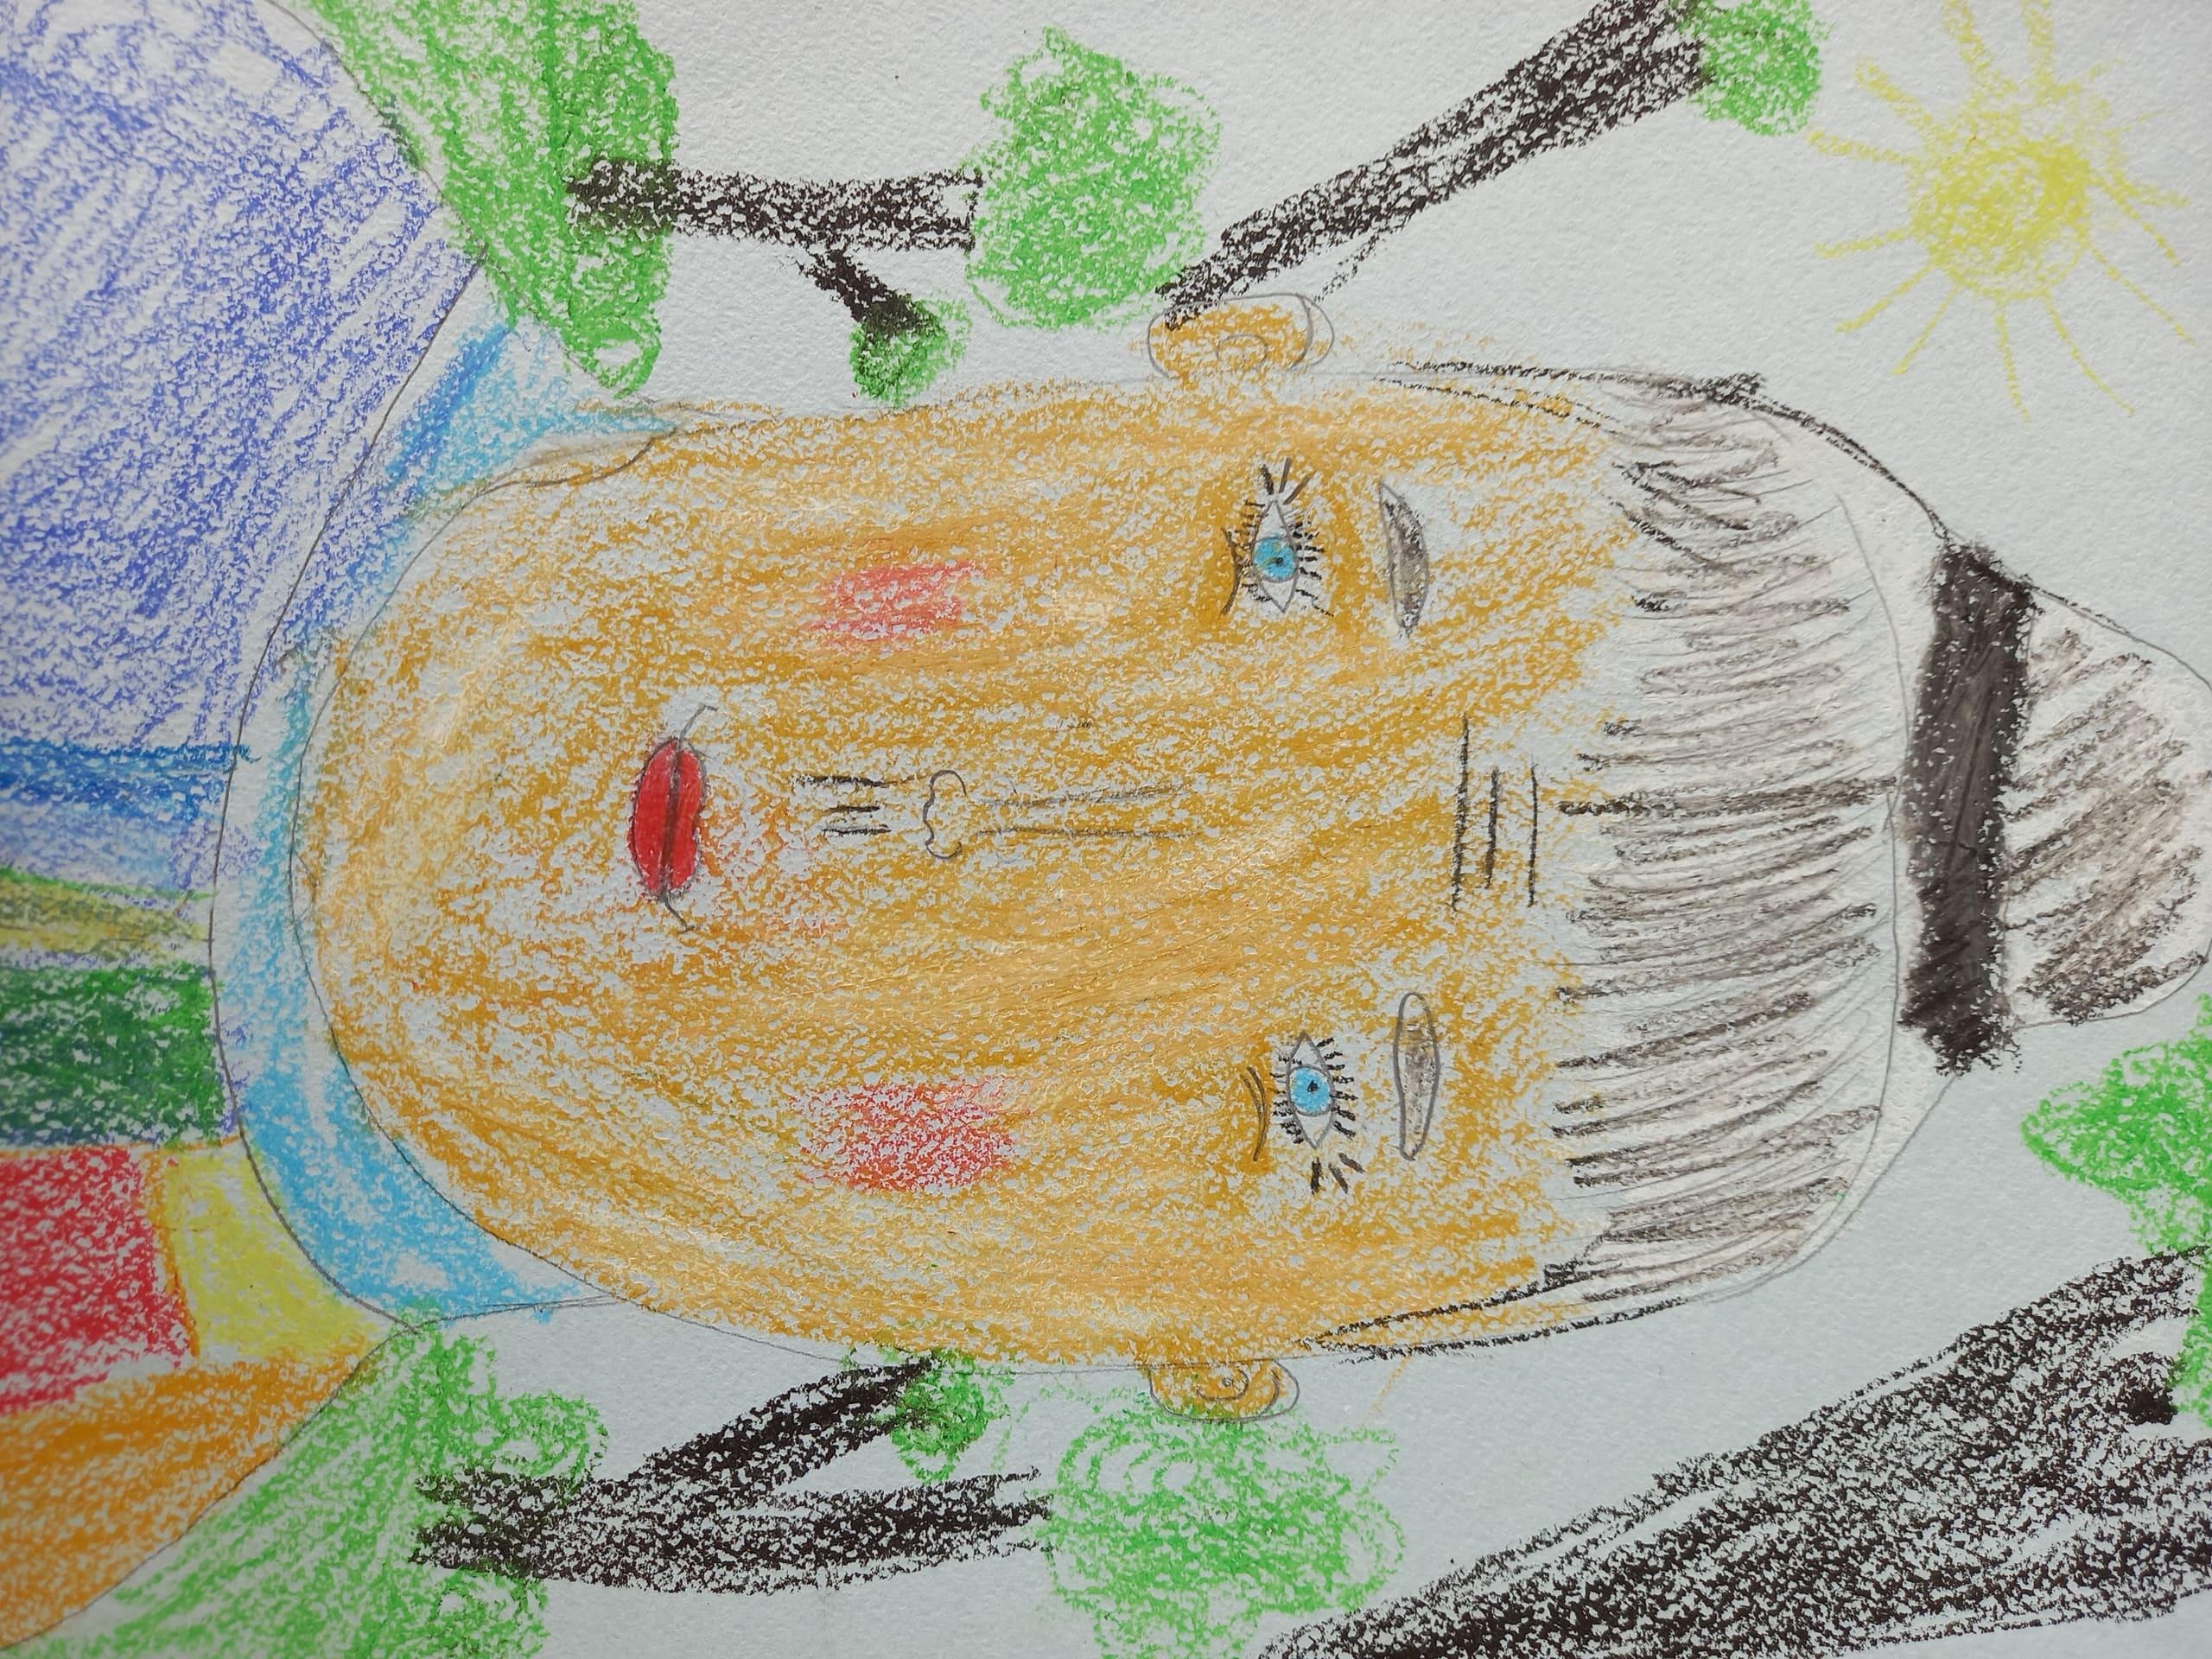 Мозжегорова Алиса, 8 лет